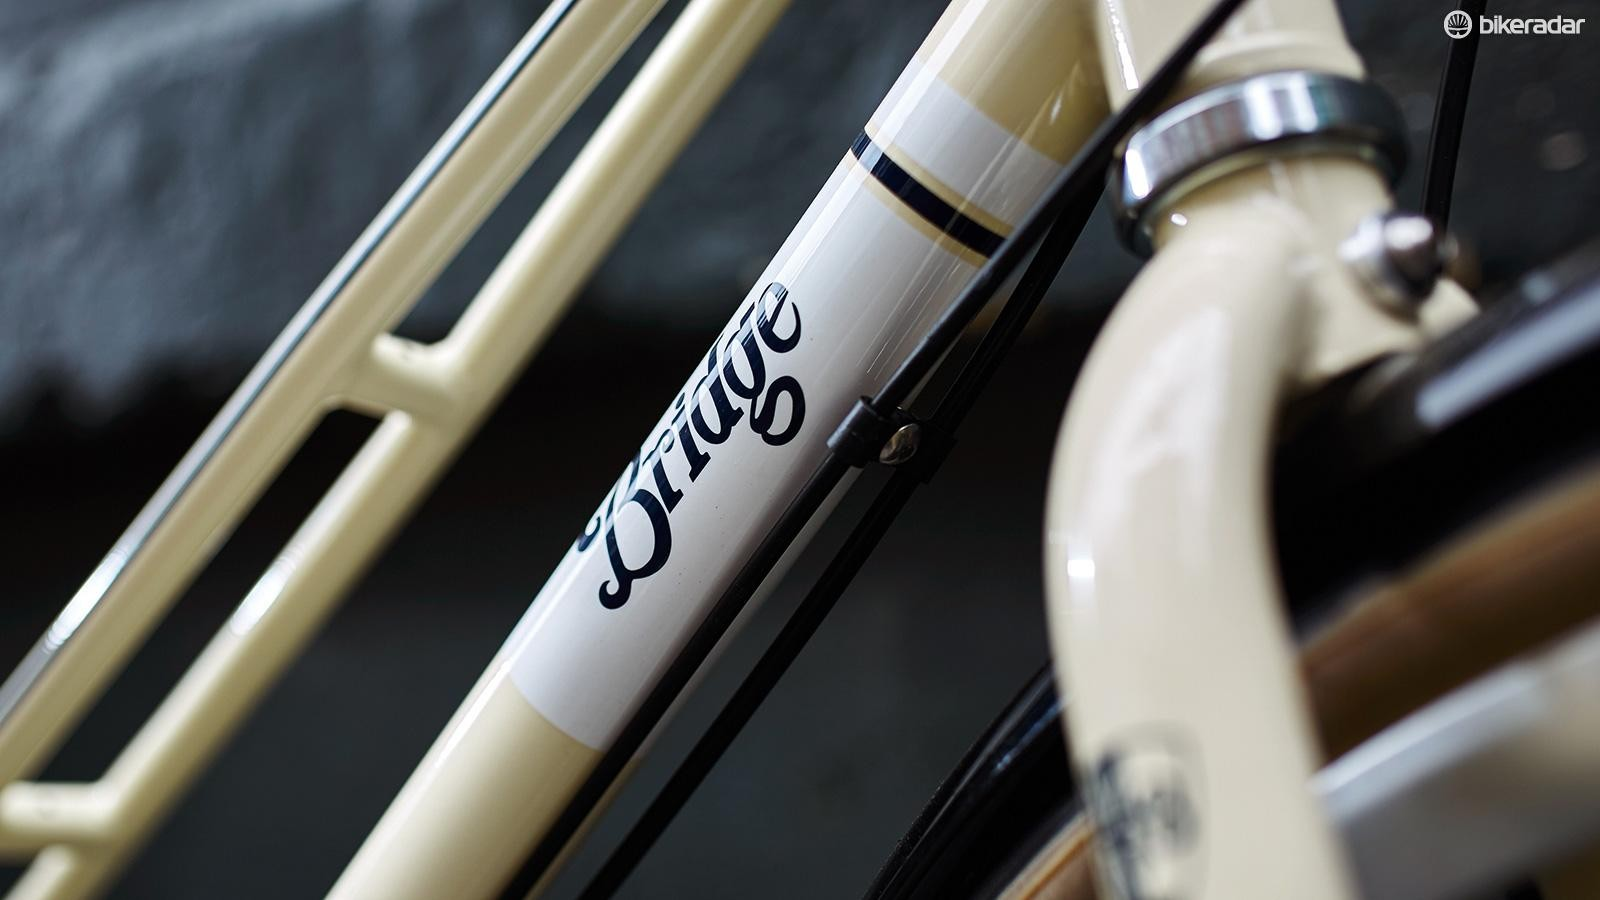 The bike has a classic, eye-catching design